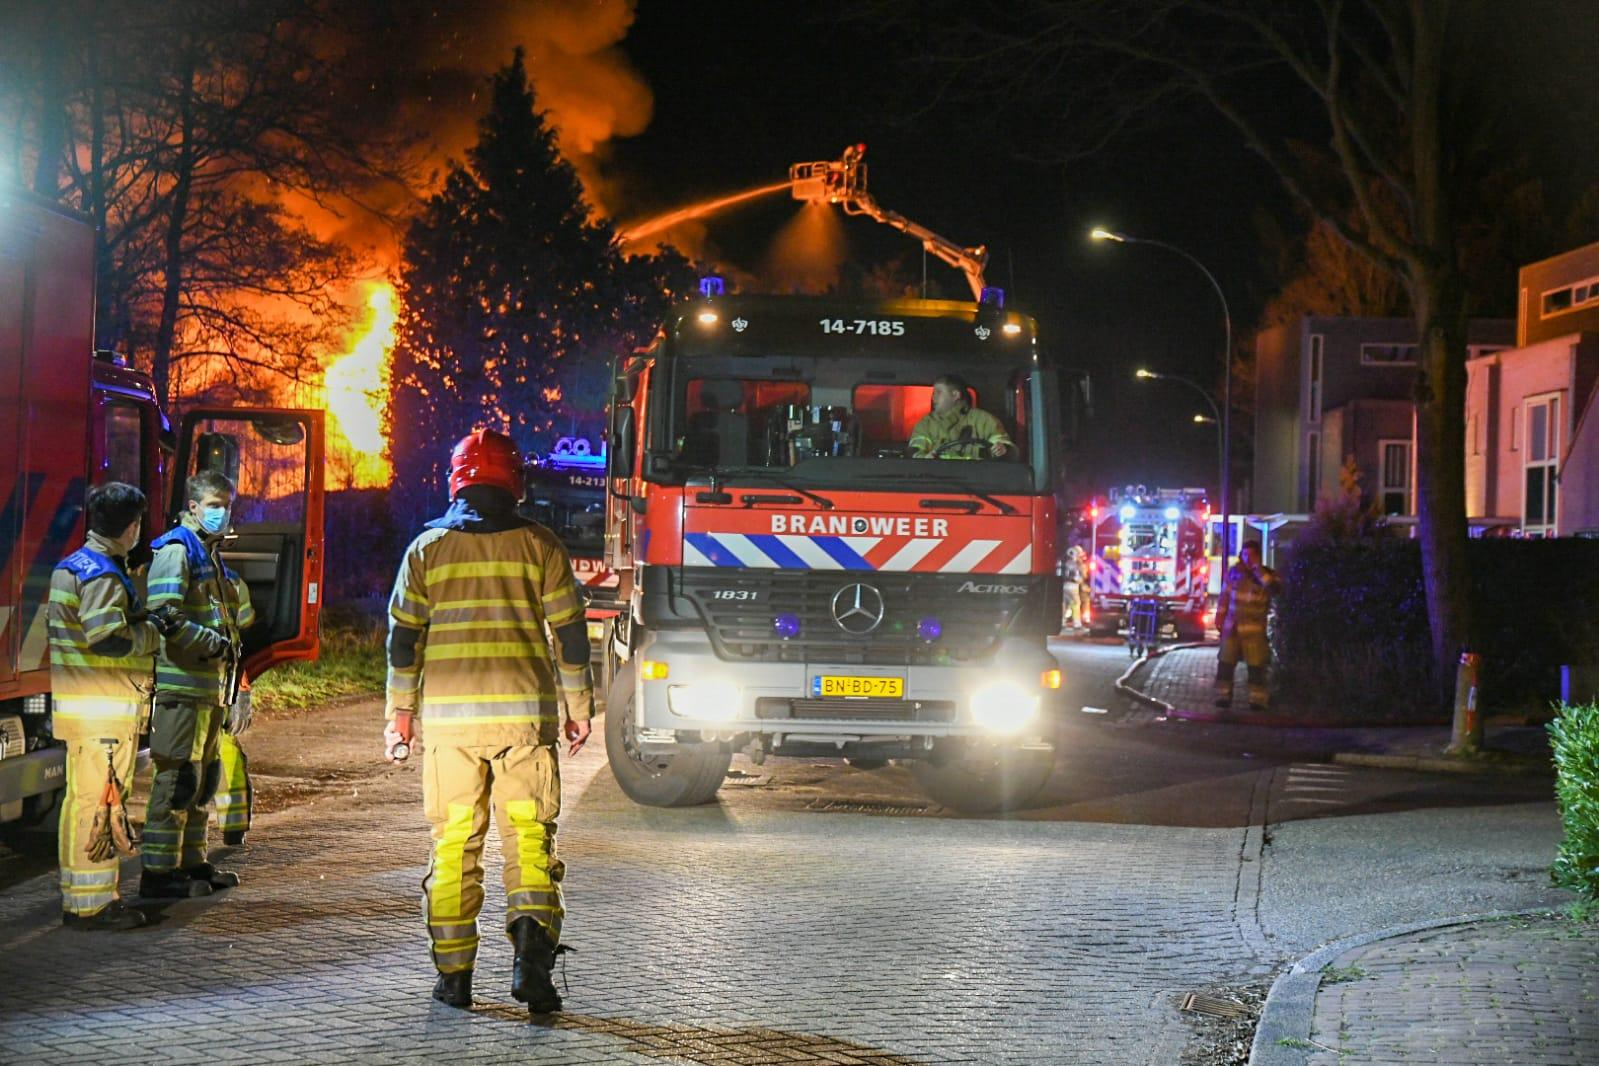 Tientallen omwonenden moeten hun huis uit vanwege grote brand op vliegveld Hilversum. Loods en woning verwoest [video]